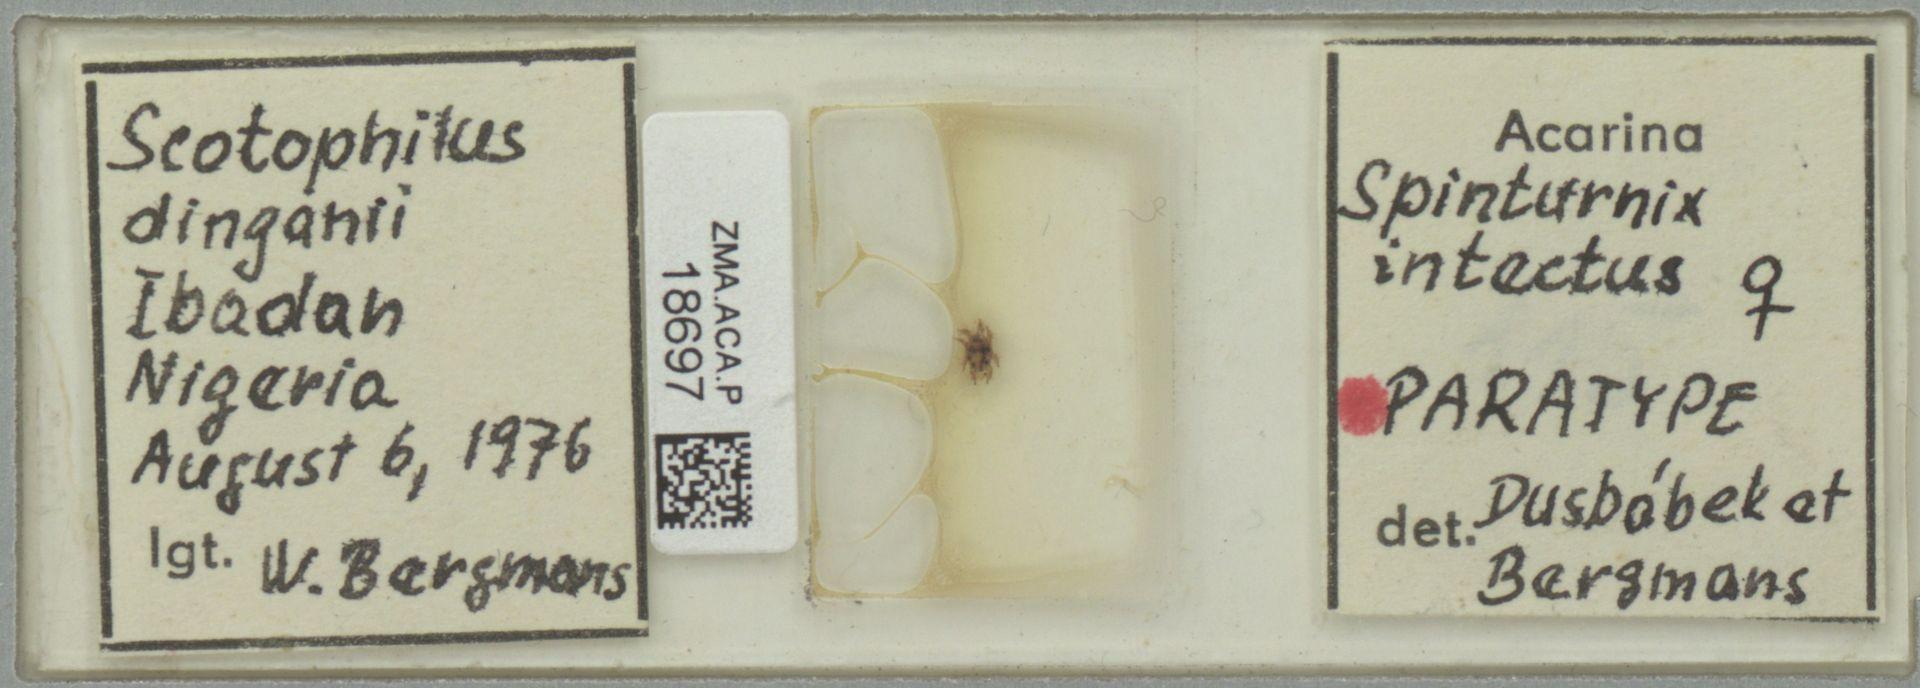 ZMA.ACA.P.18697 | Spinturnix intectus